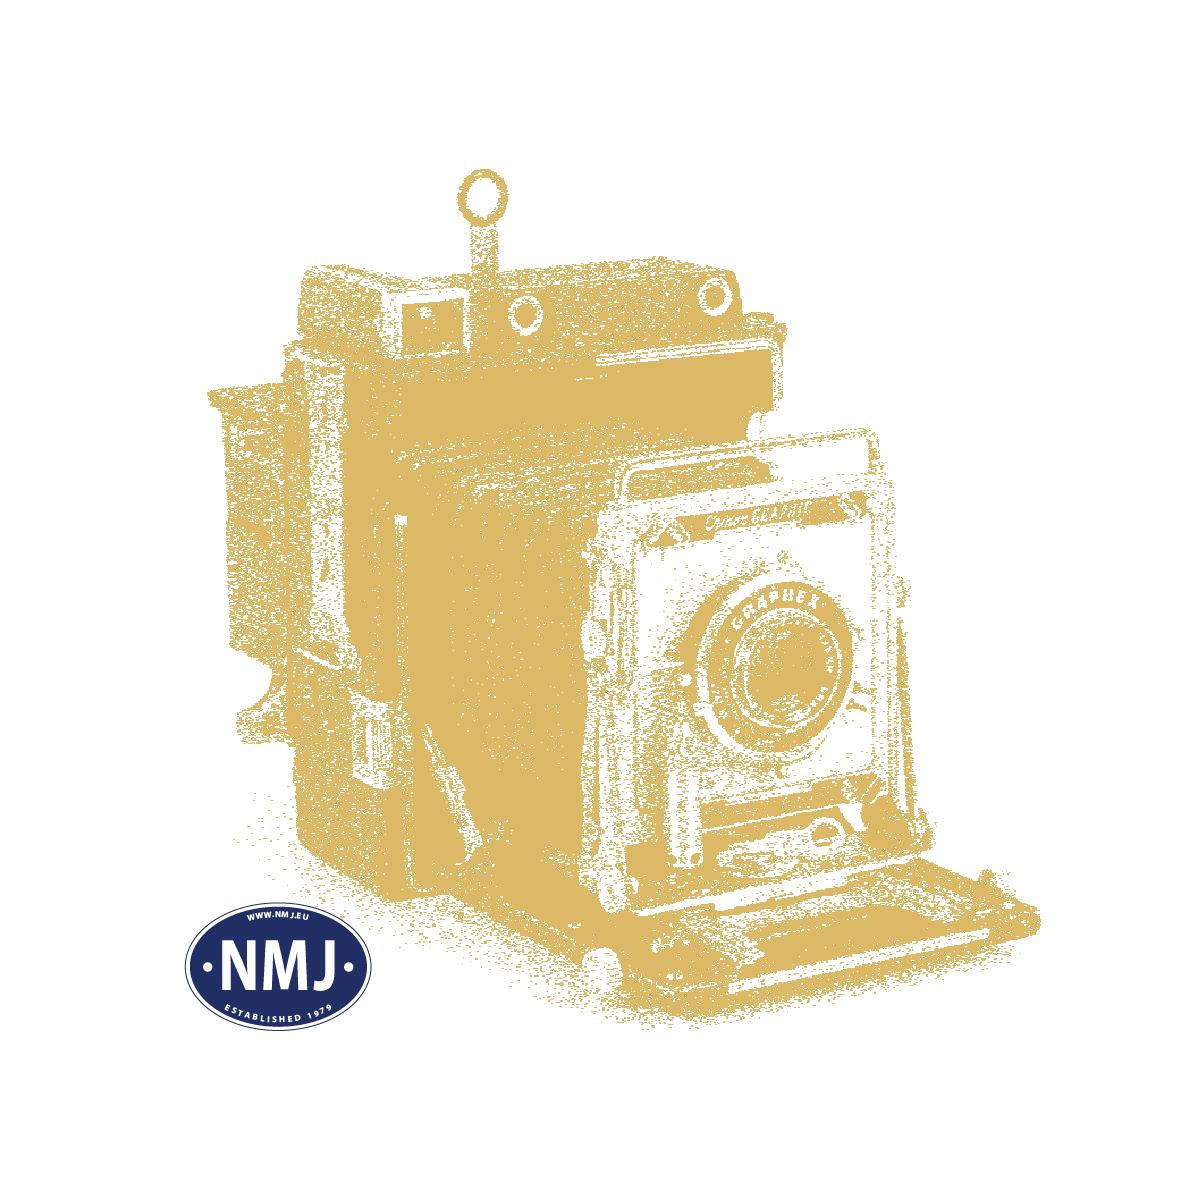 NMJT95304 - NMJ Topline CFL 1601 (1956-1971), AC Digital